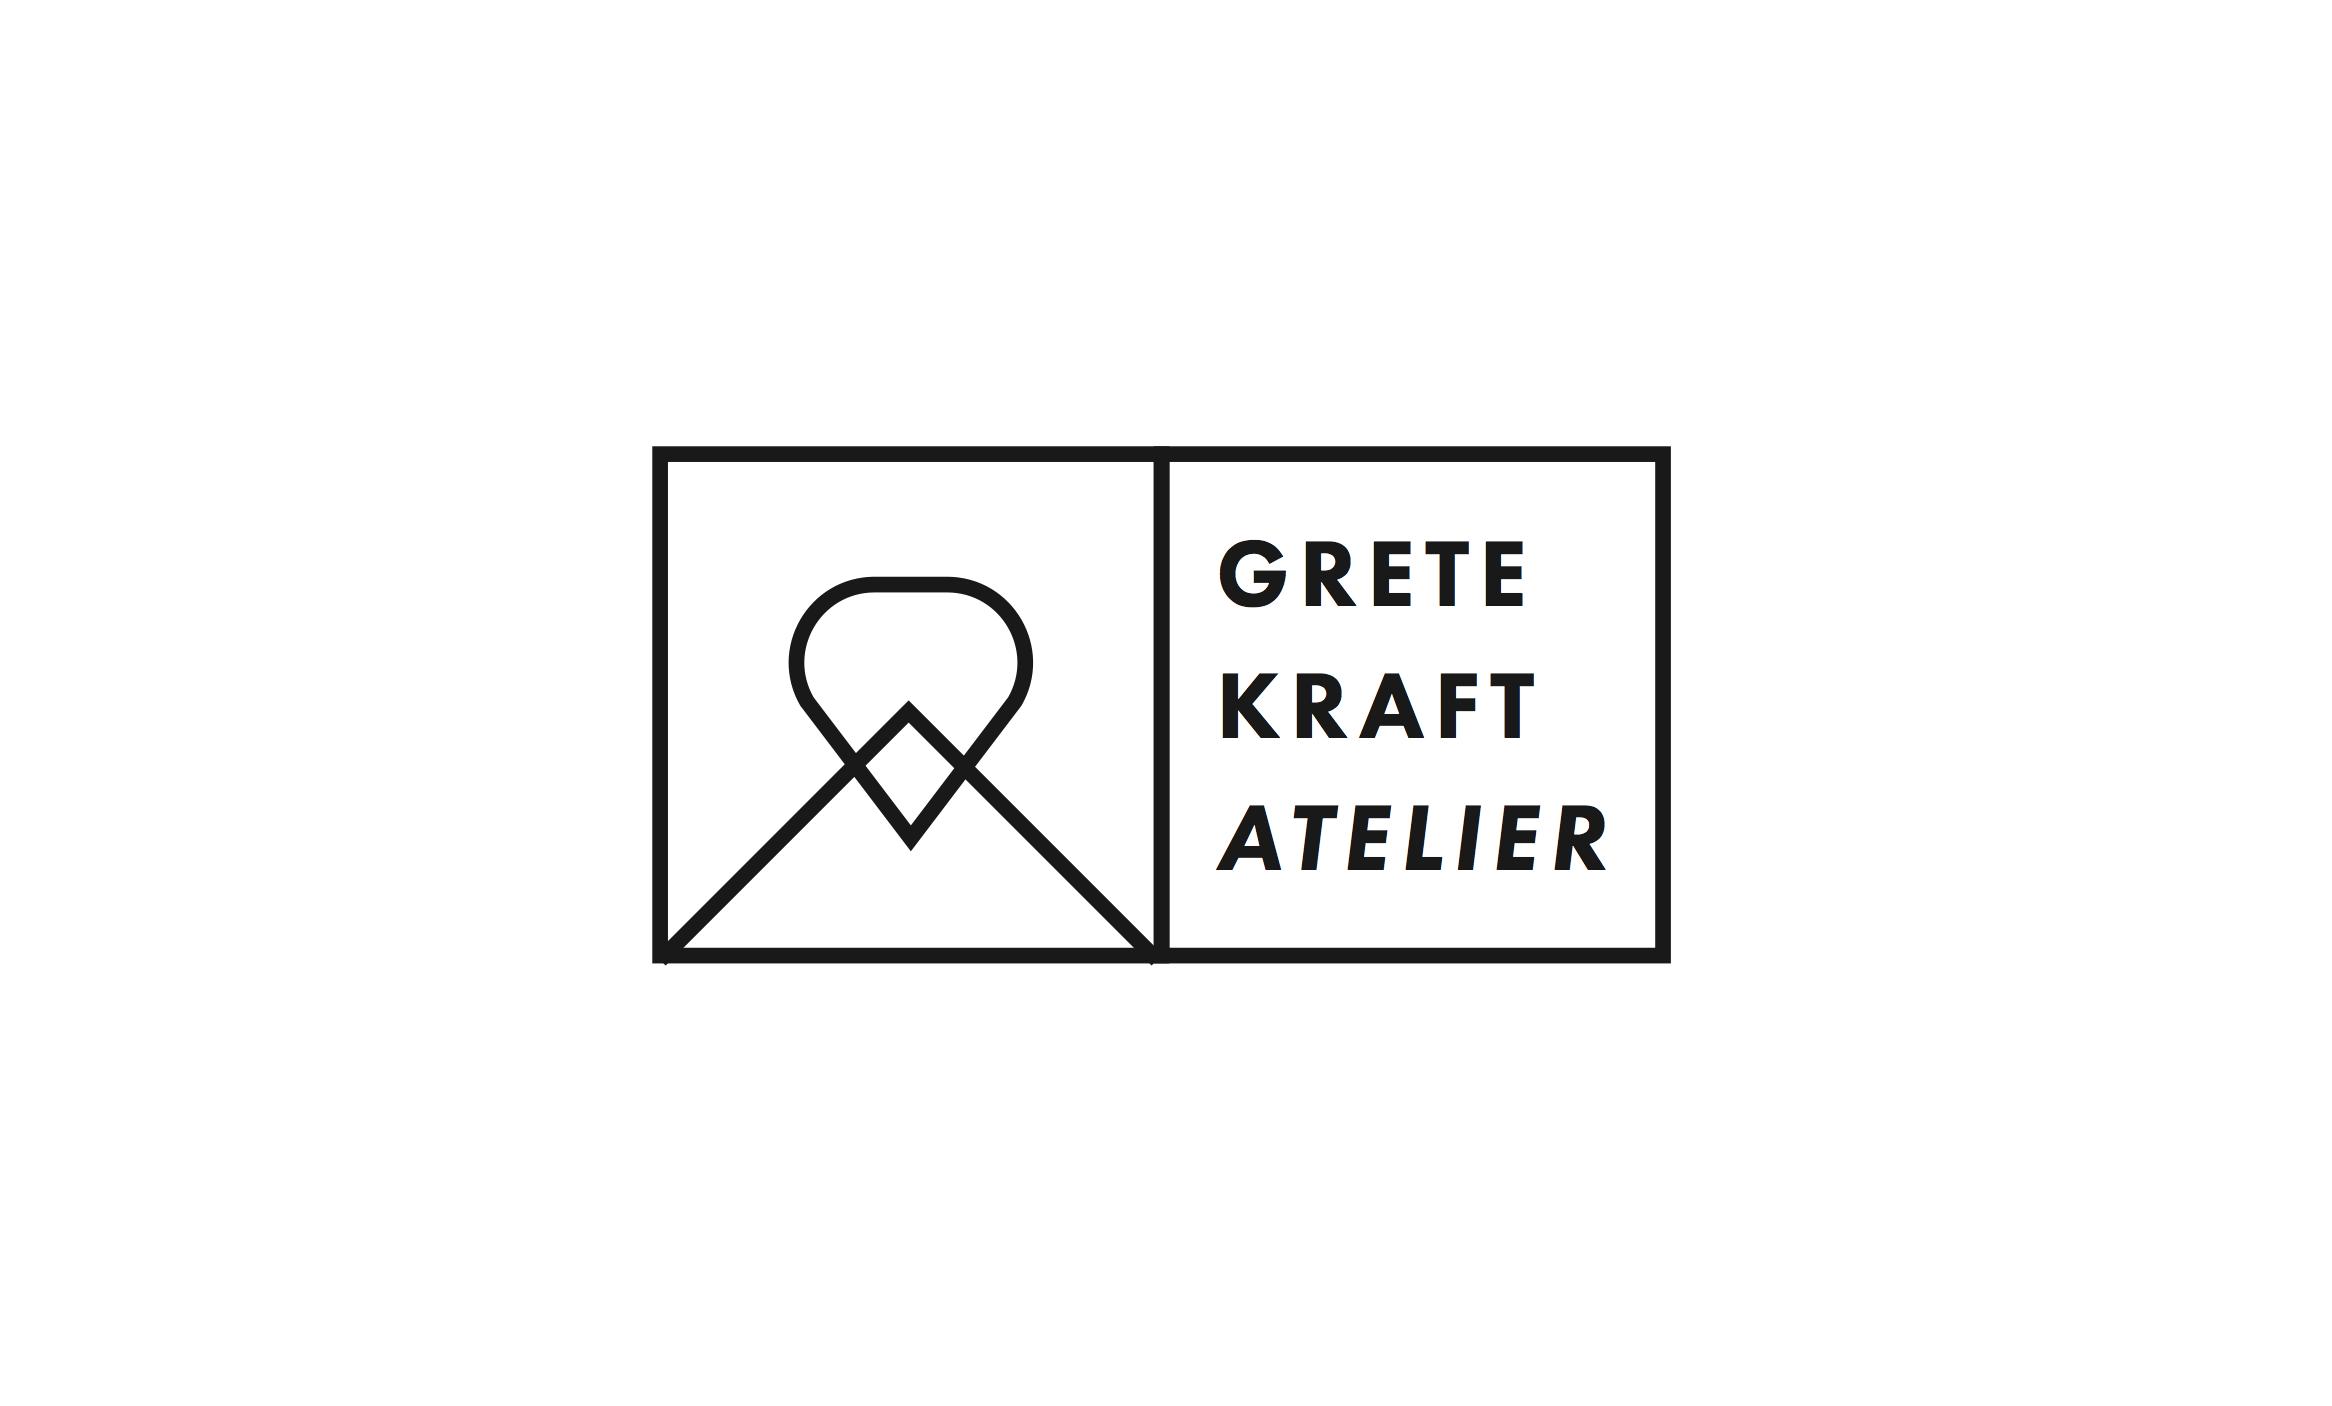 Grete_Kraft_Brand+Icon-07.jpg